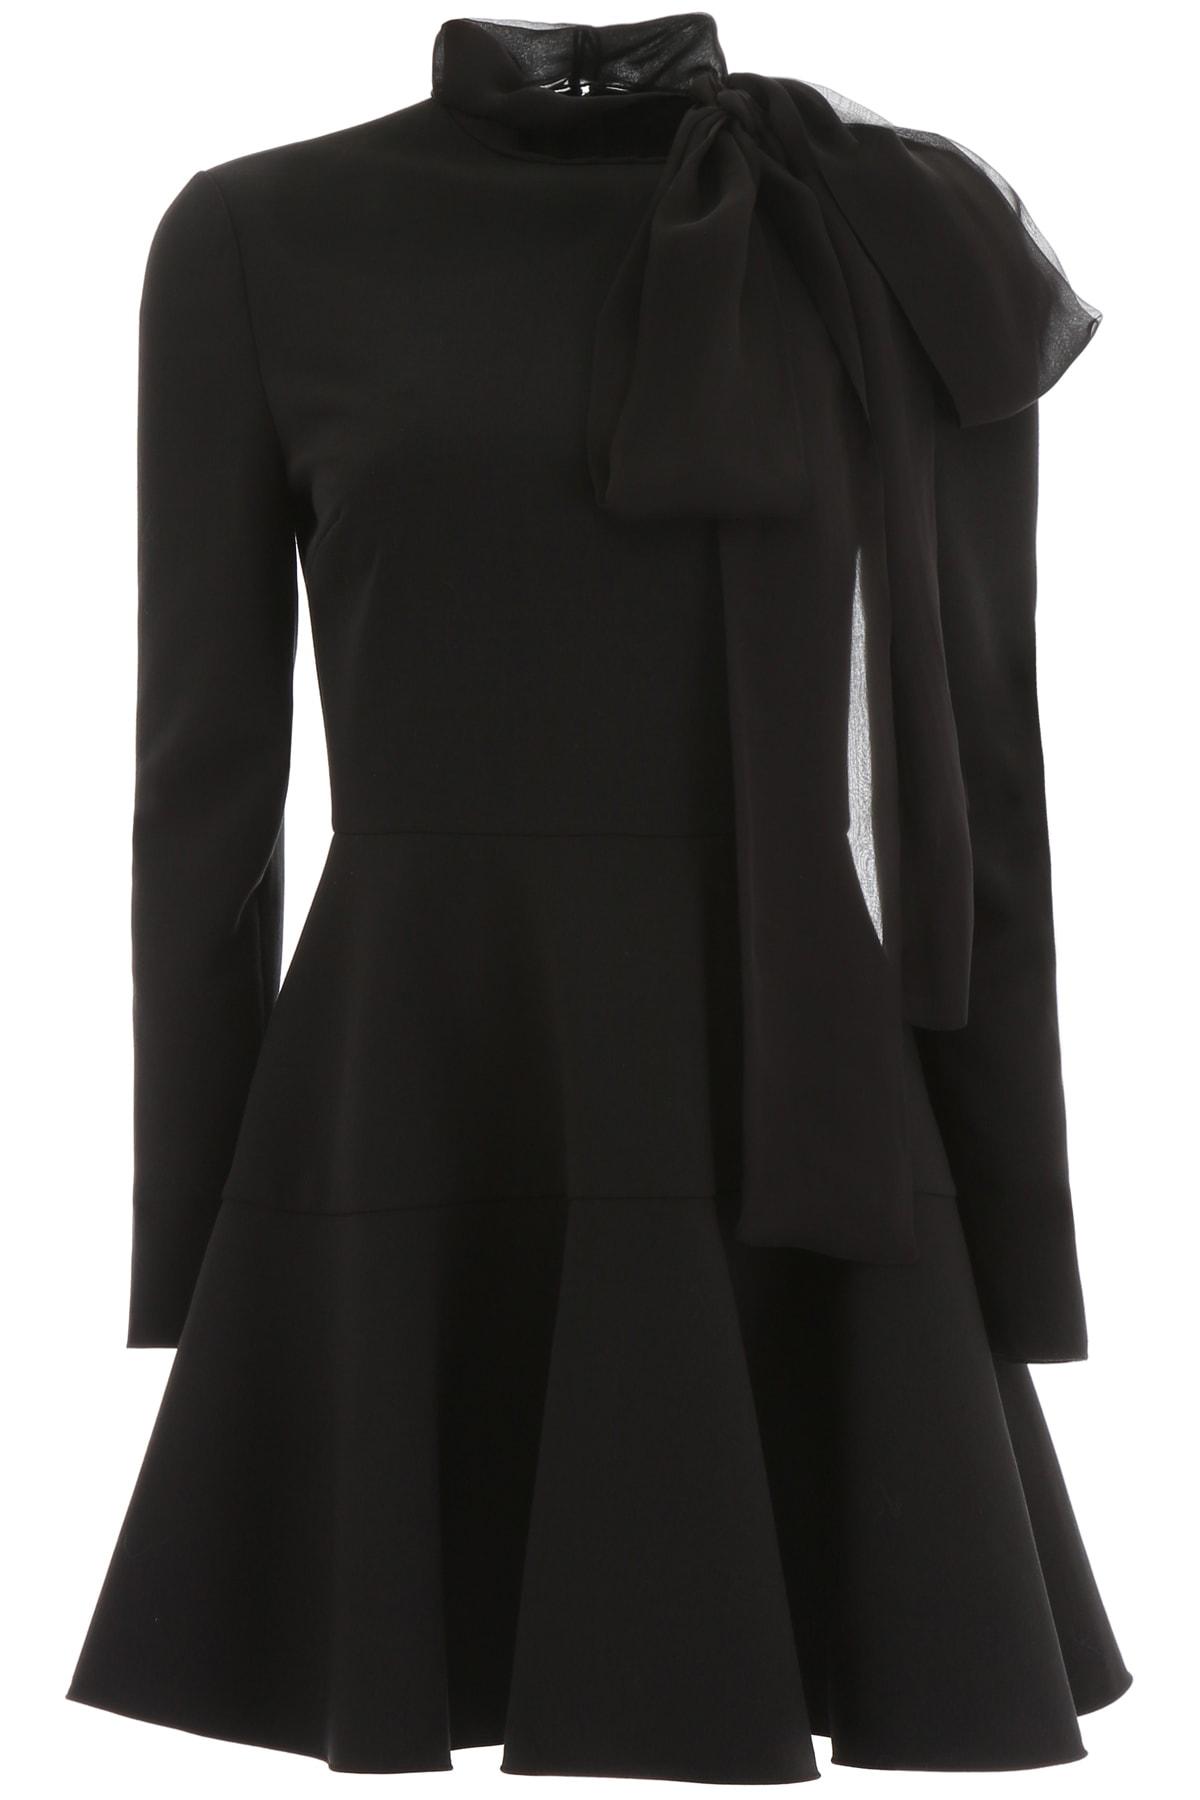 Valentino Mini Dress With Chiffon Bow